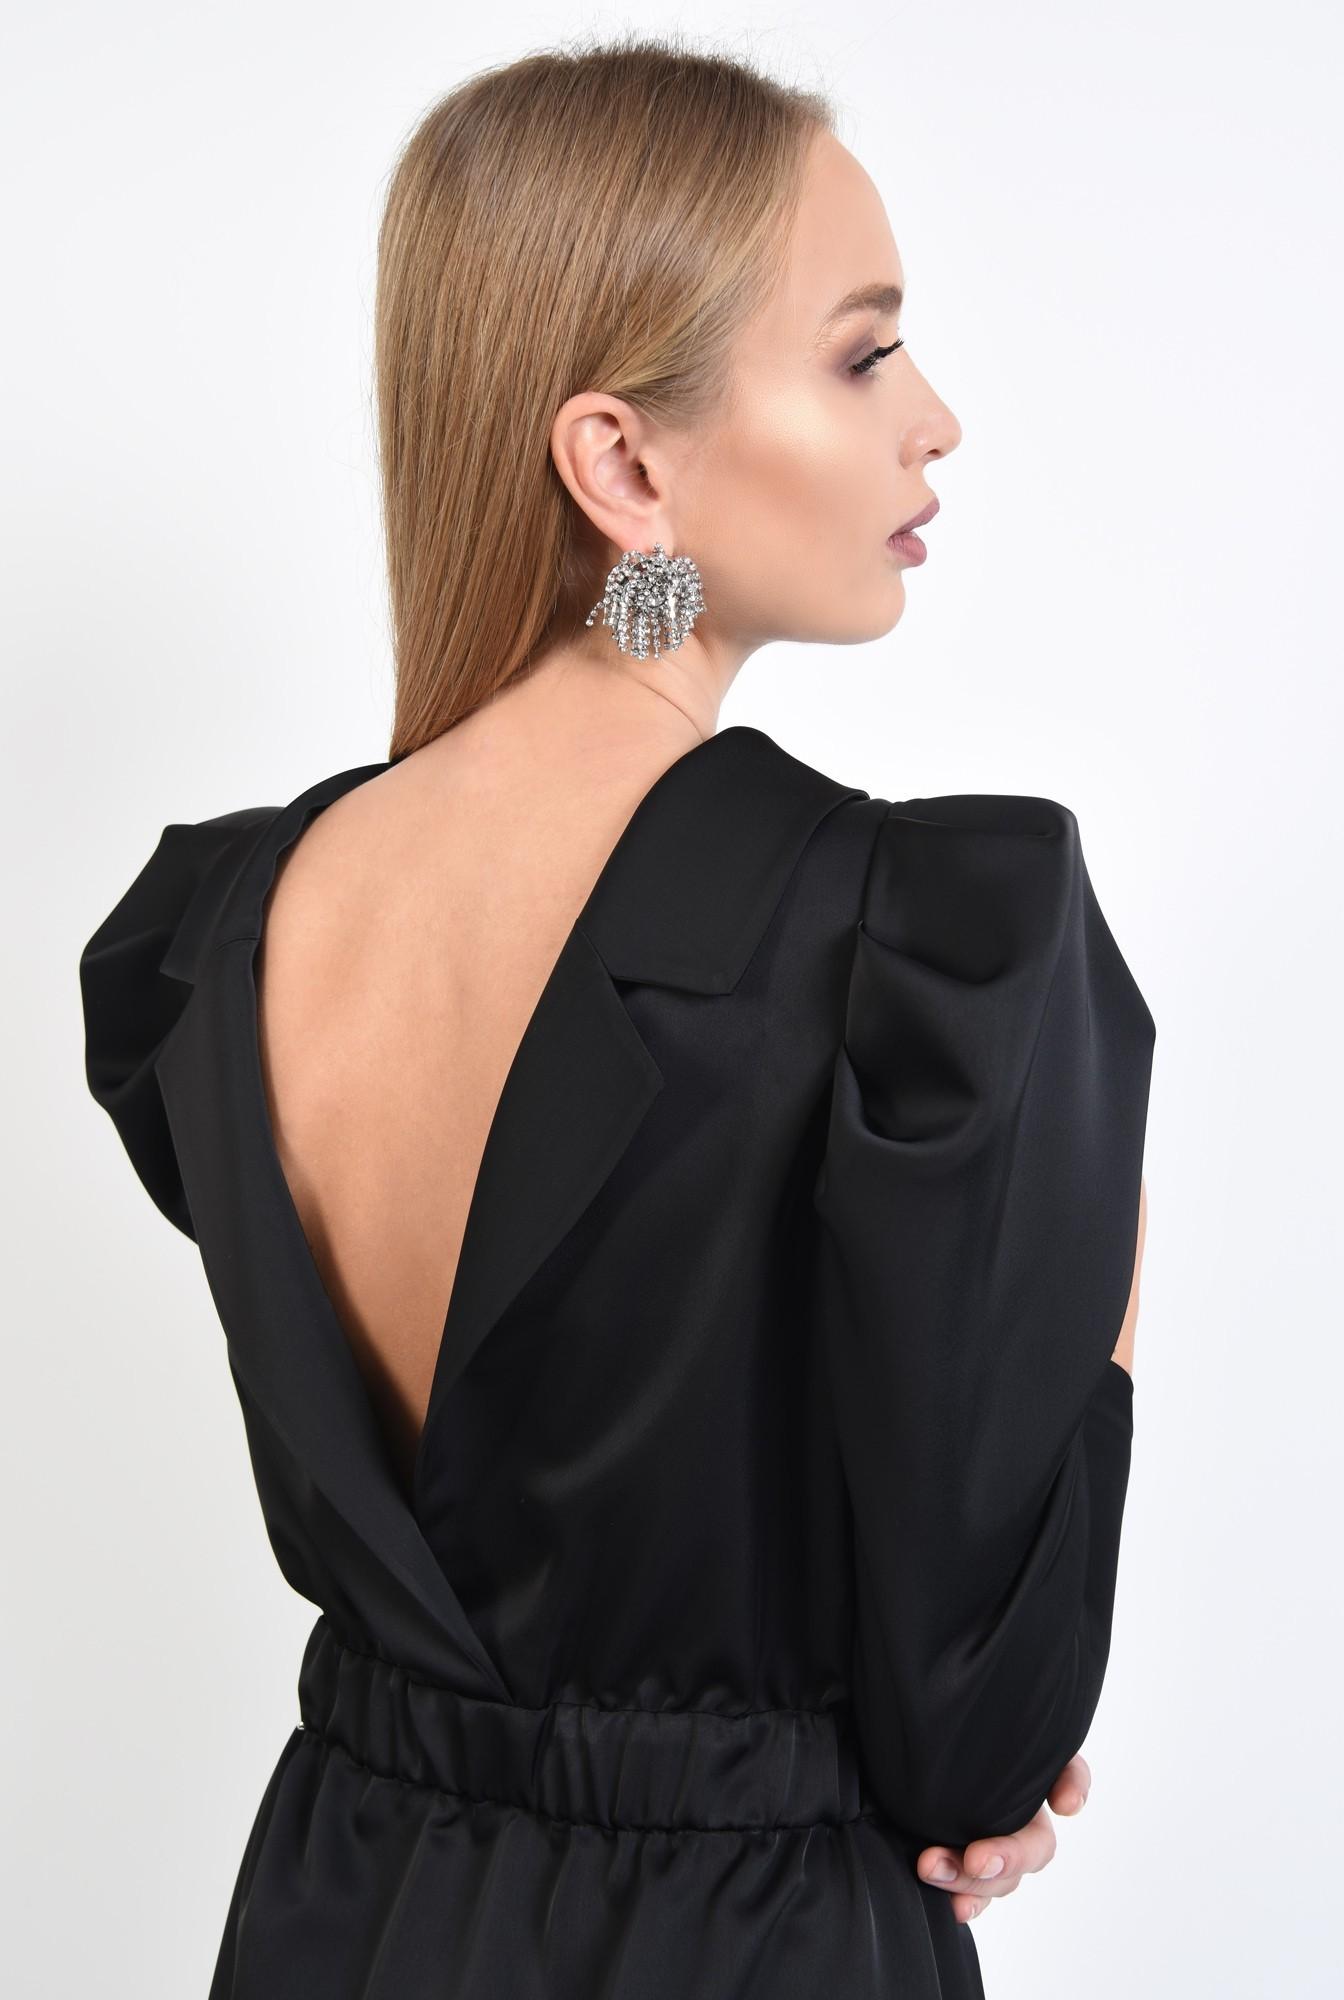 2 - 360 - rochie de ocazie, neagra, mini, maneci fantezie, tesatura satinata